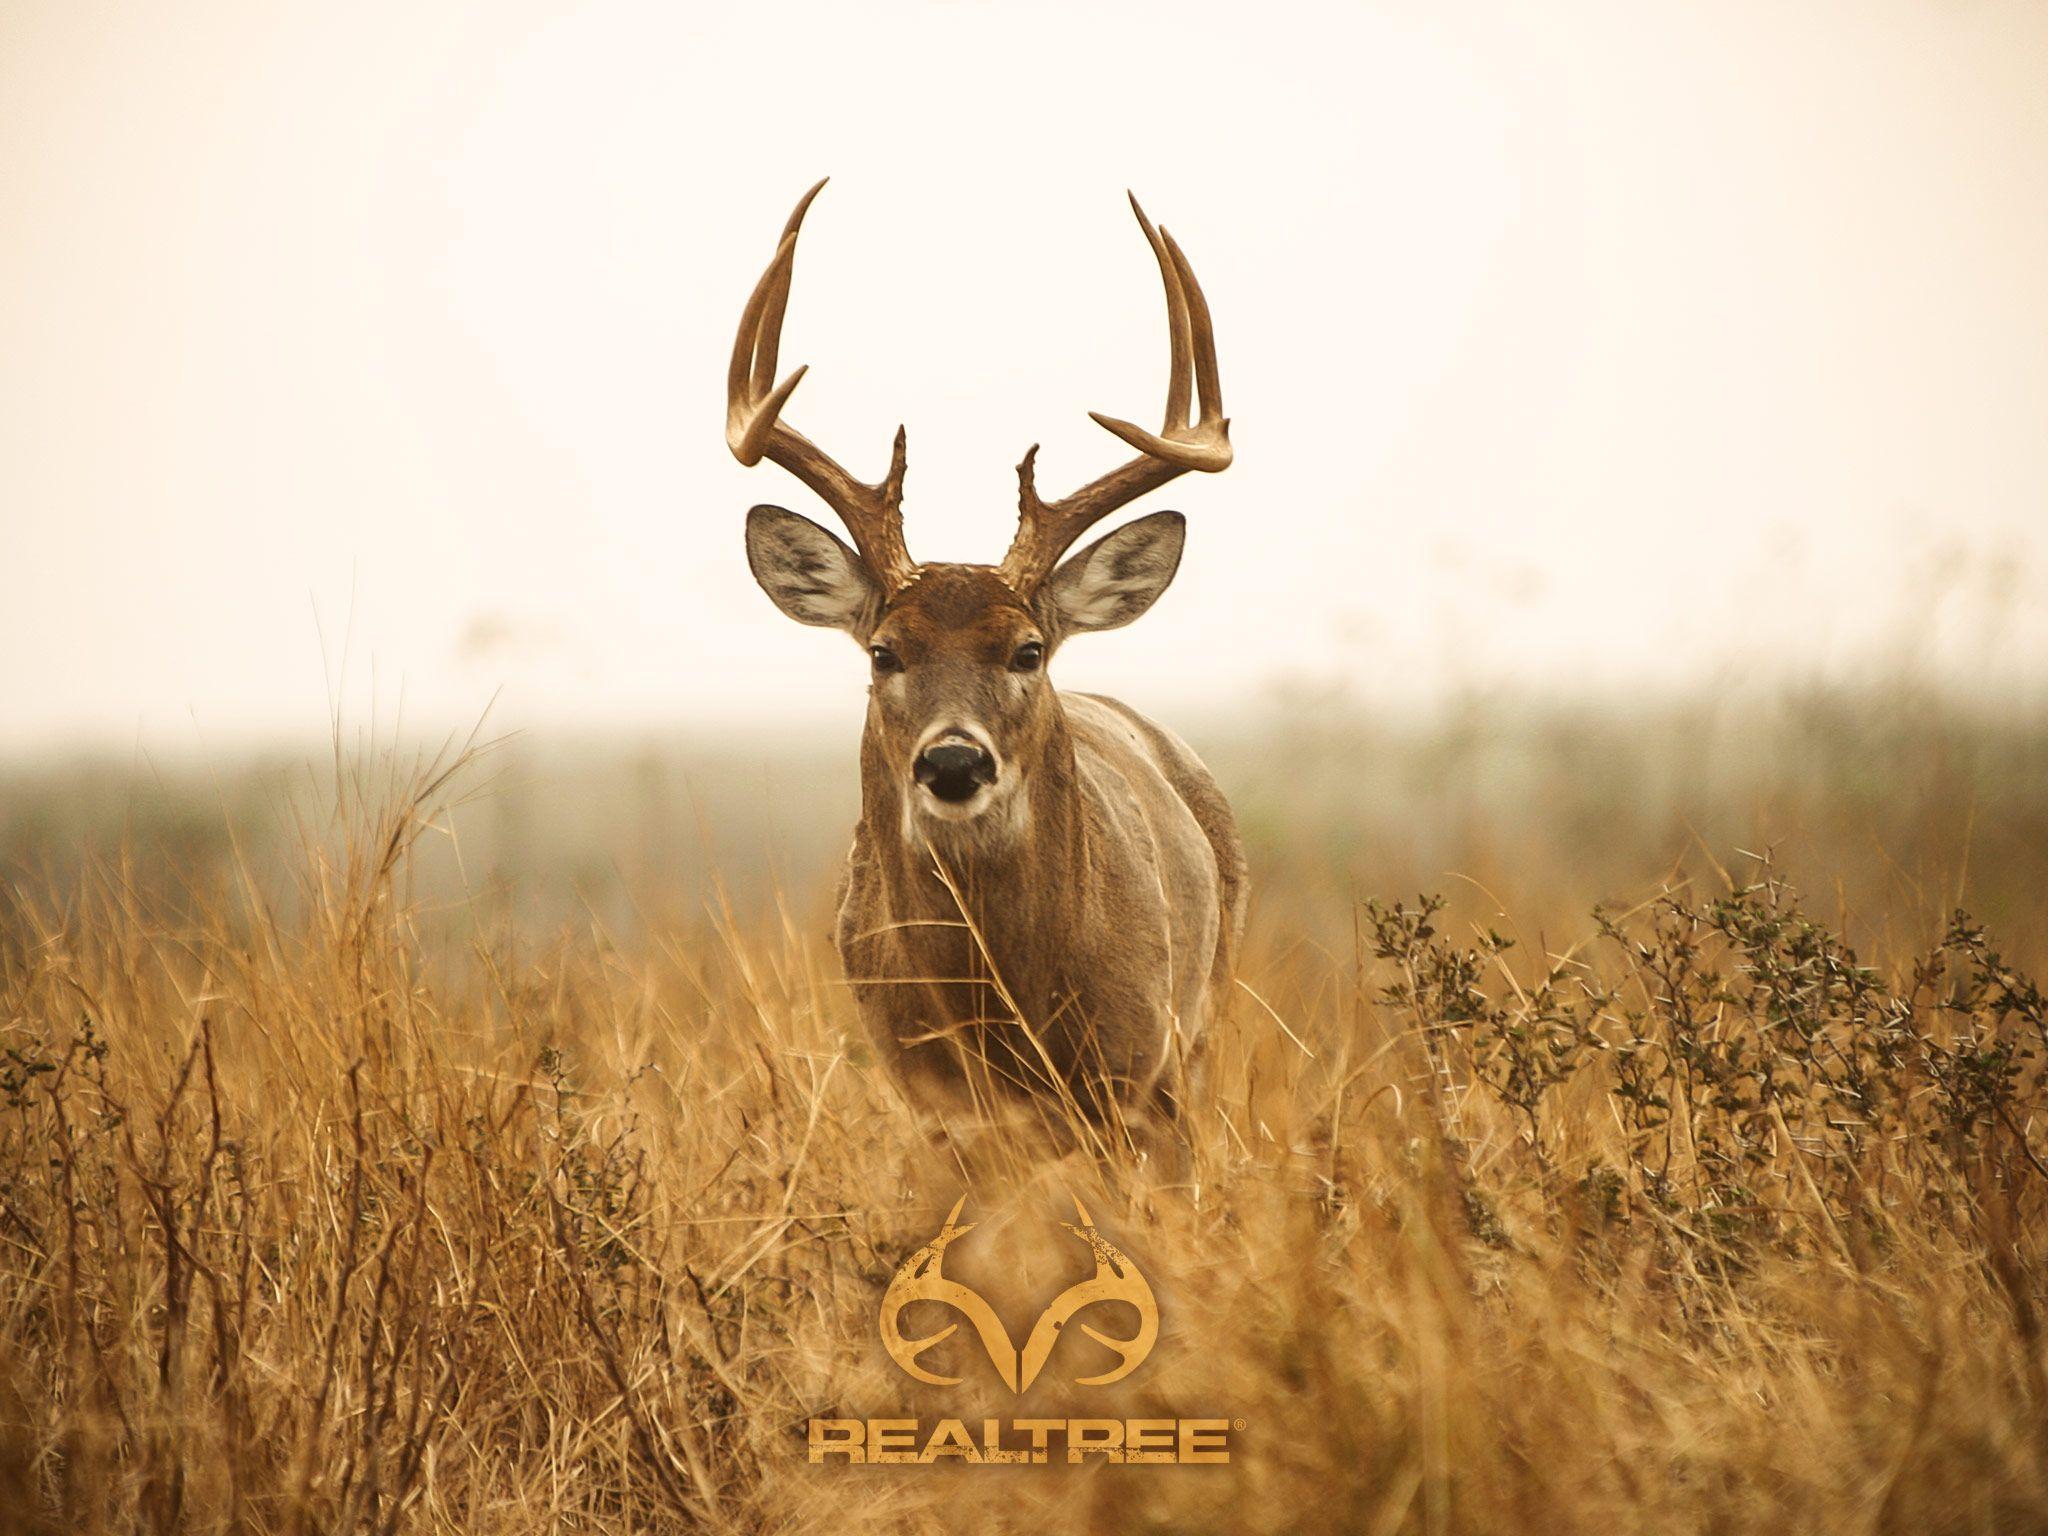 Top Whitetail Deer Hd Wallpapers Wallpapers | Shared in 2019 | Deer wallpaper, Hunting wallpaper ...